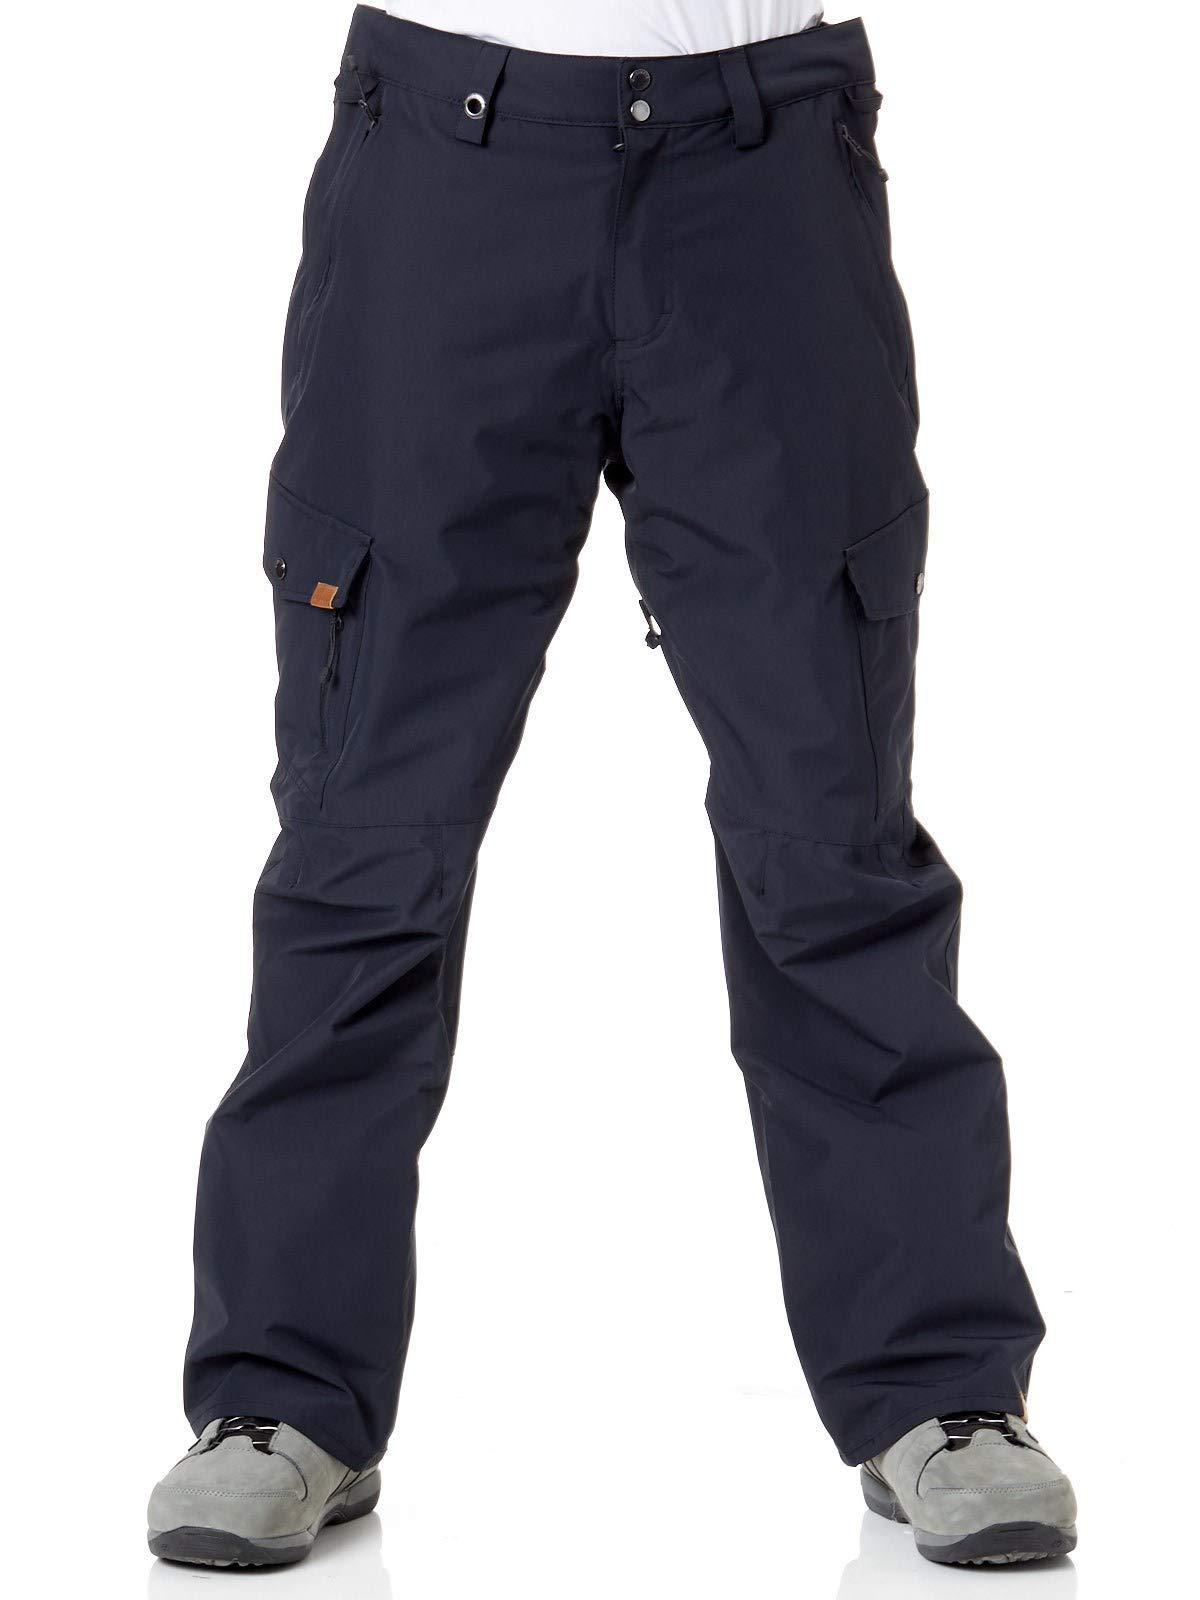 Quiksilver Black Porter Snowboarding Pants